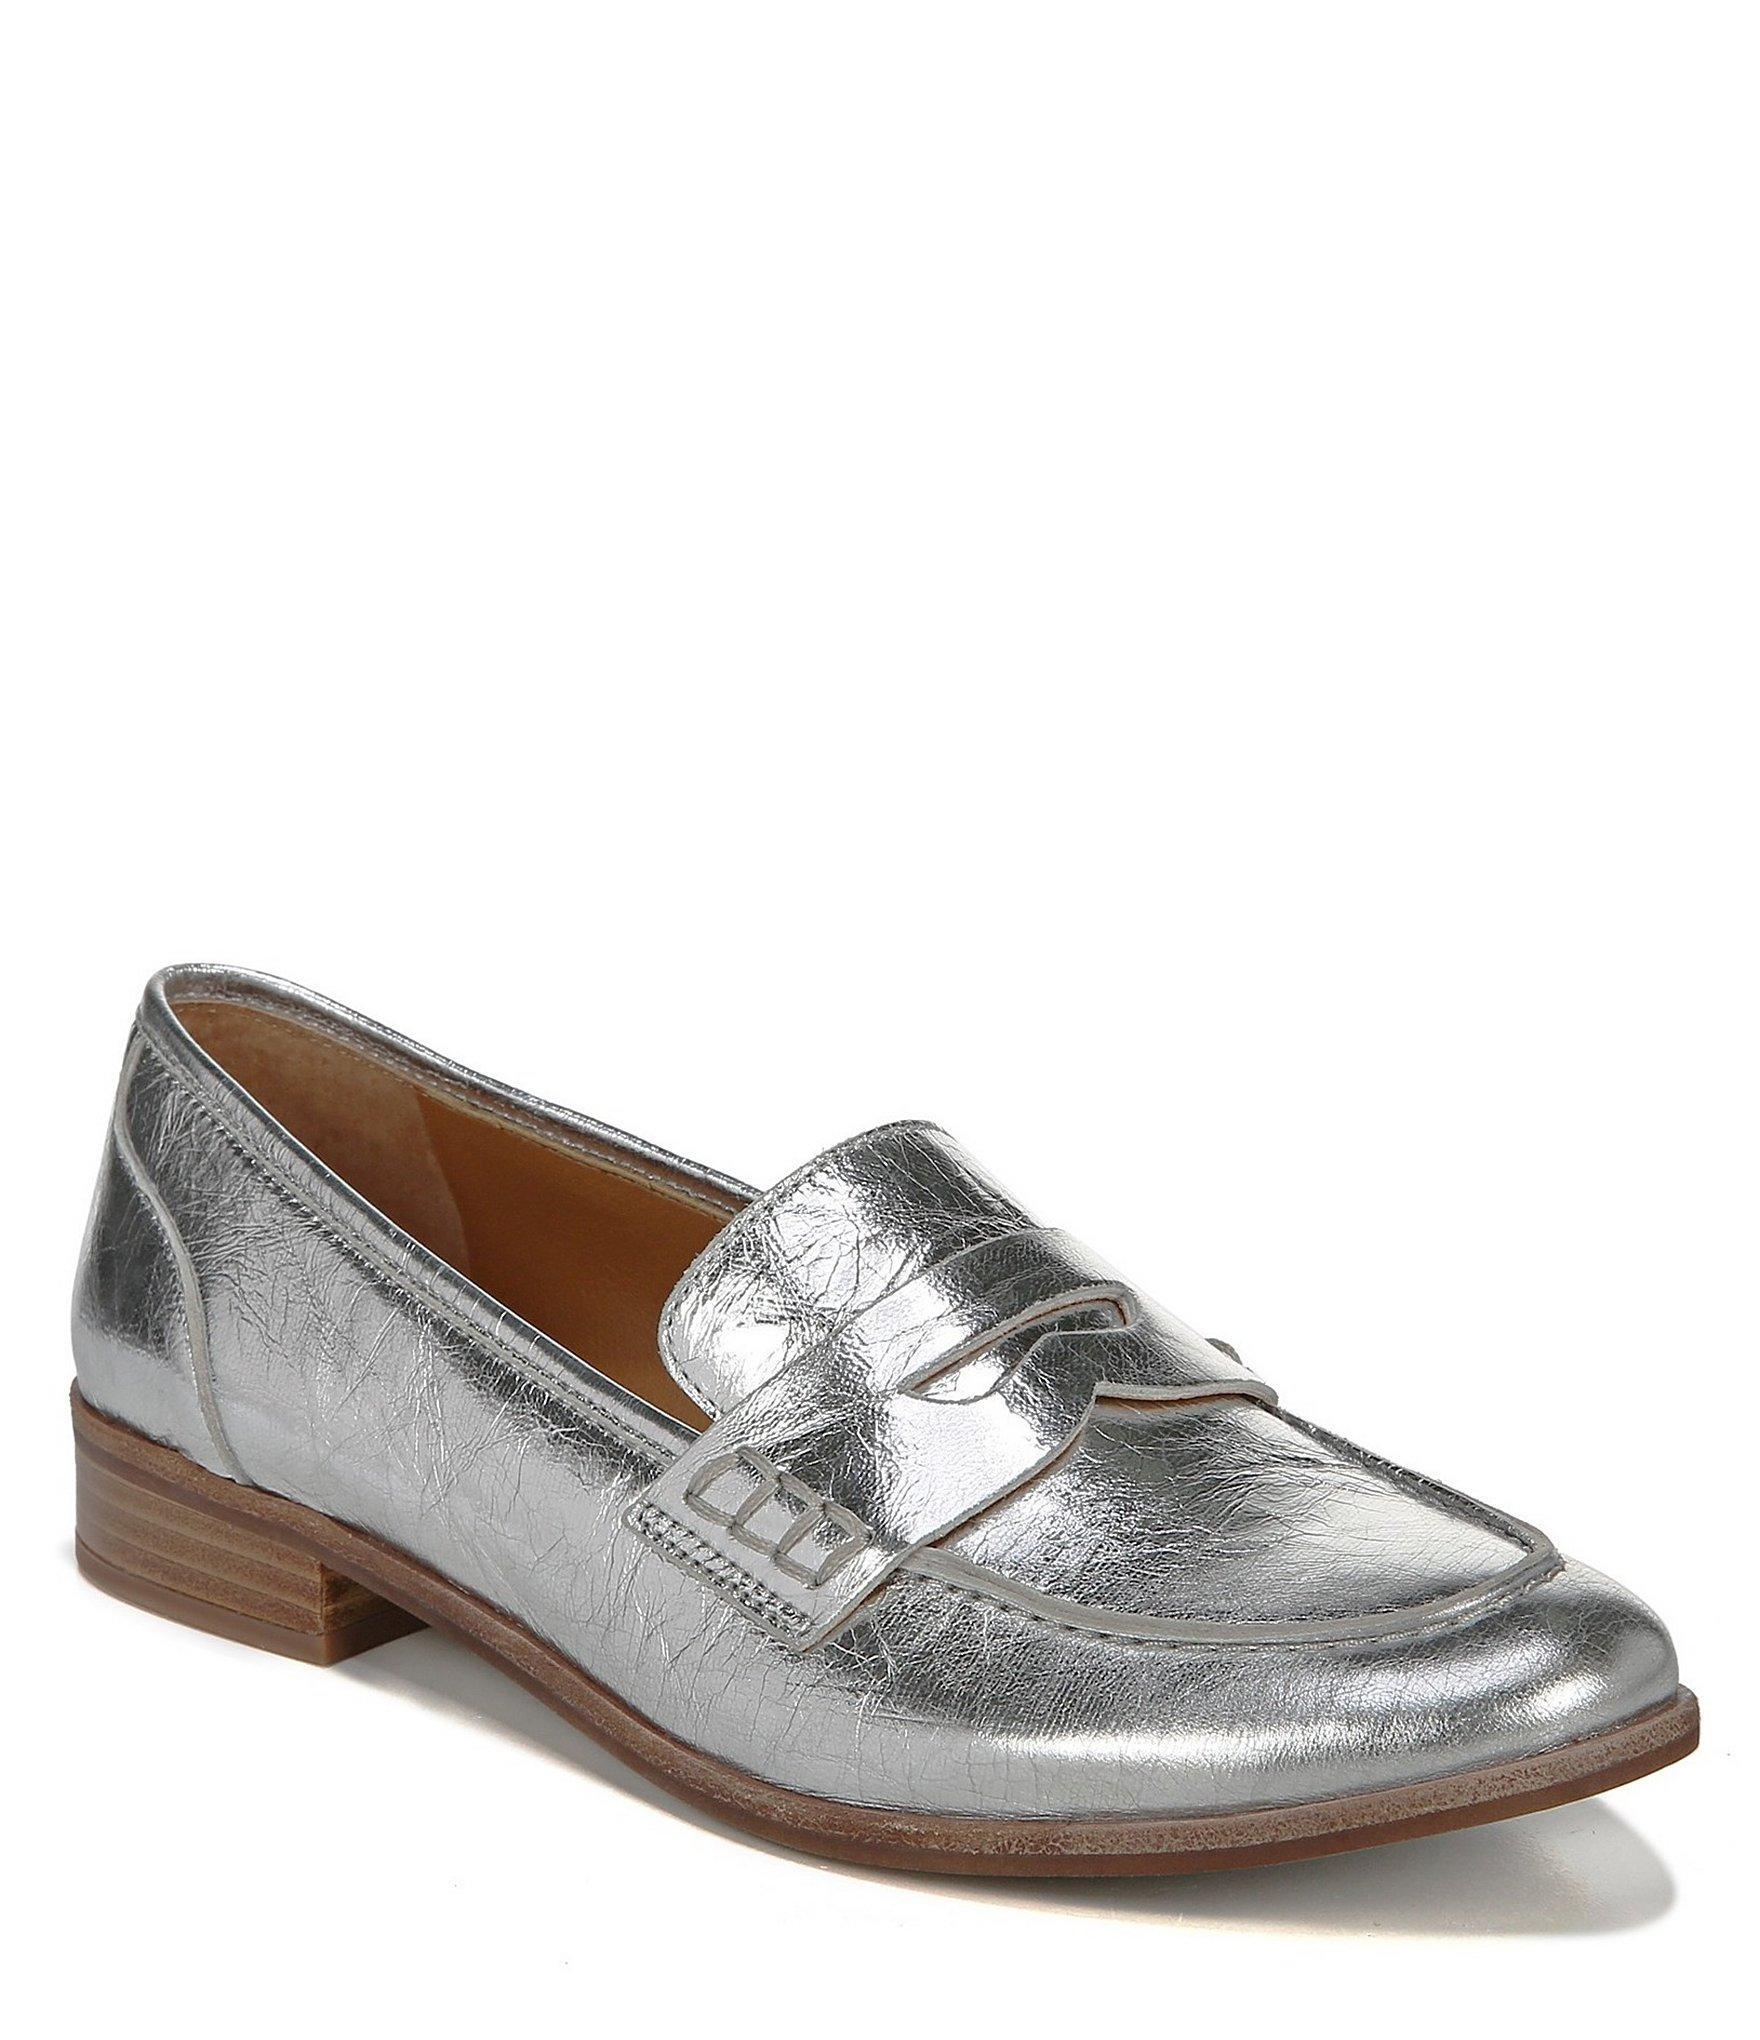 c5847d9a84c Franco Sarto. Women s Sarto By Jolette Metallic Leather Block Heel Loafers